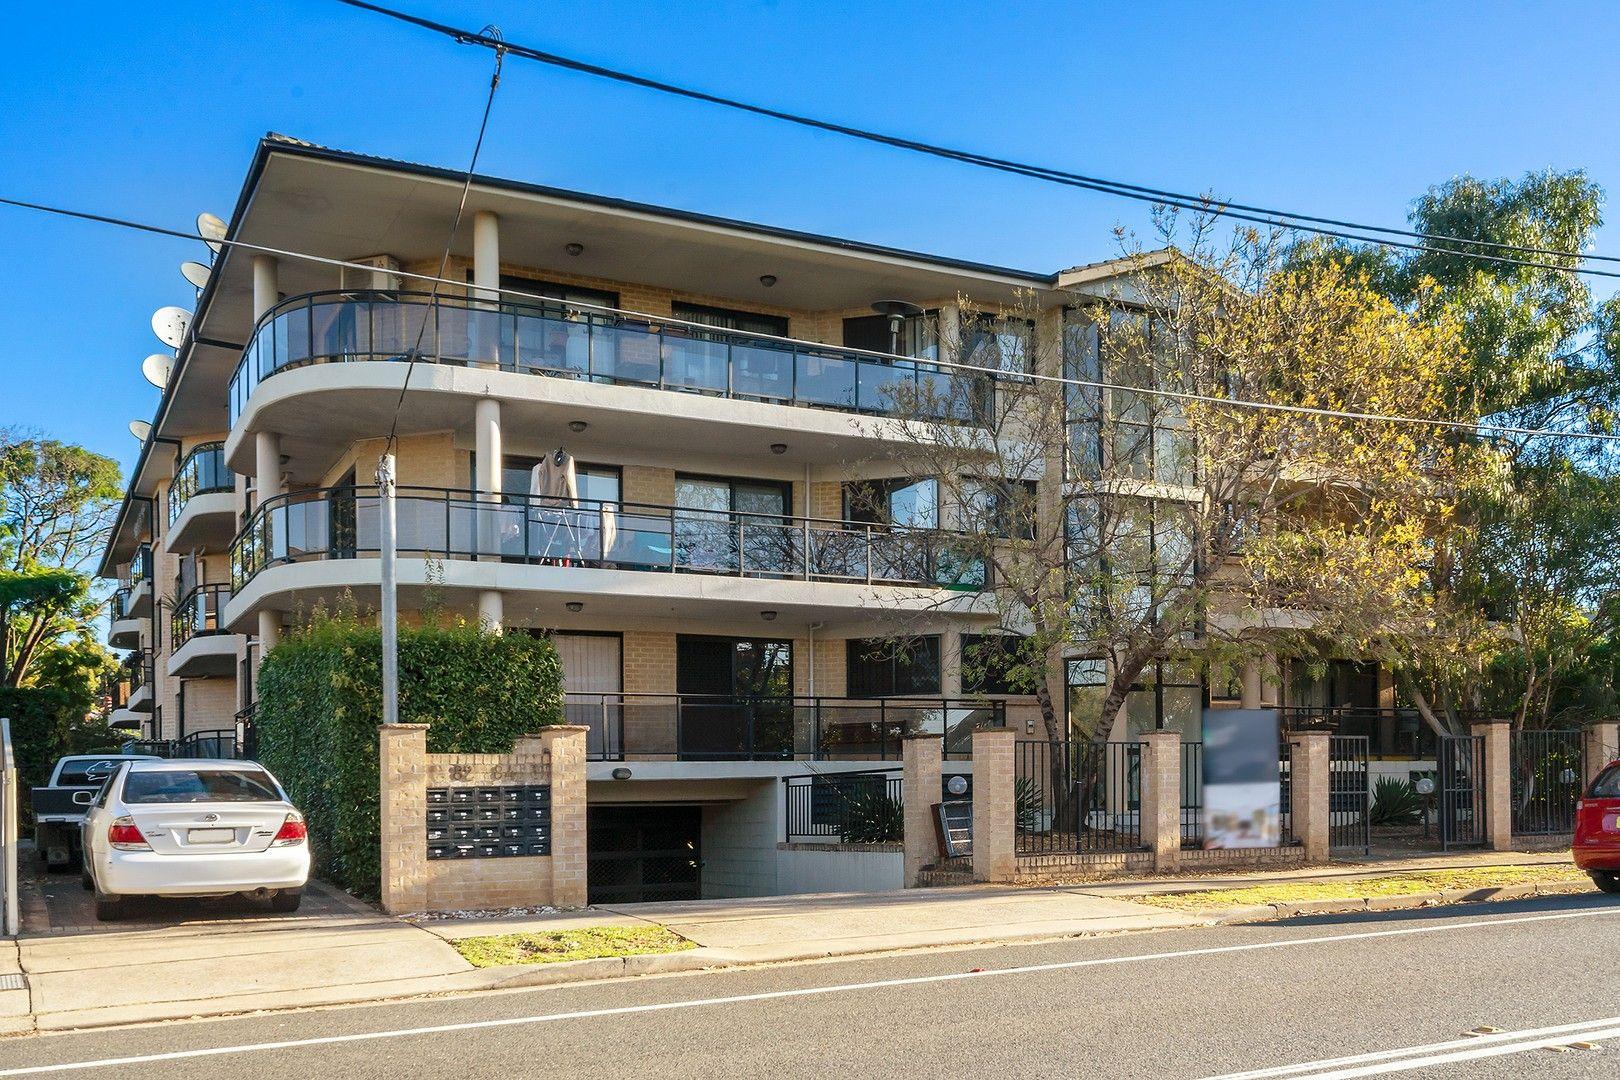 6/82-84 Beaconsfield Street, Silverwater NSW 2128, Image 0